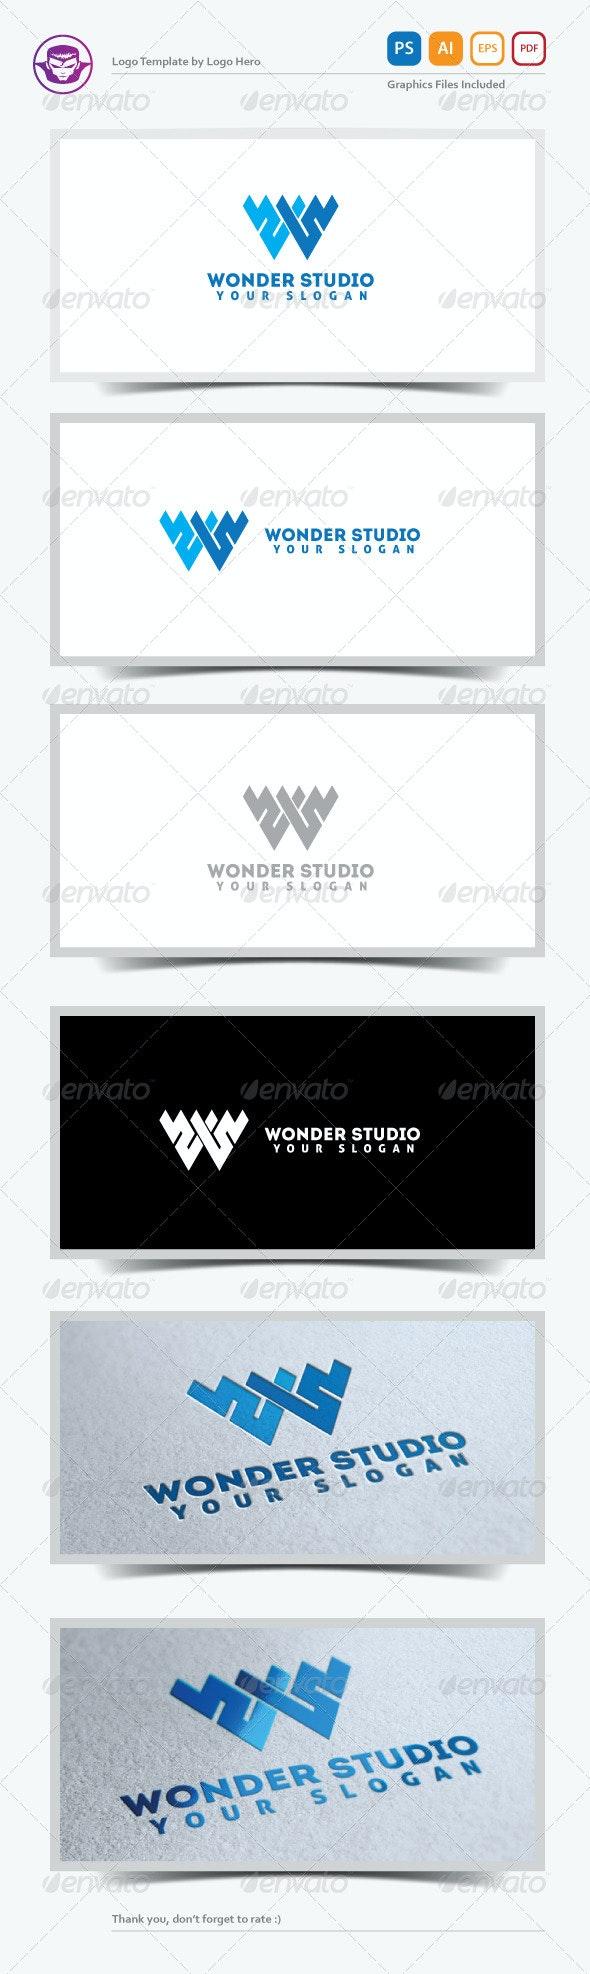 Wonder Studio Logo Template